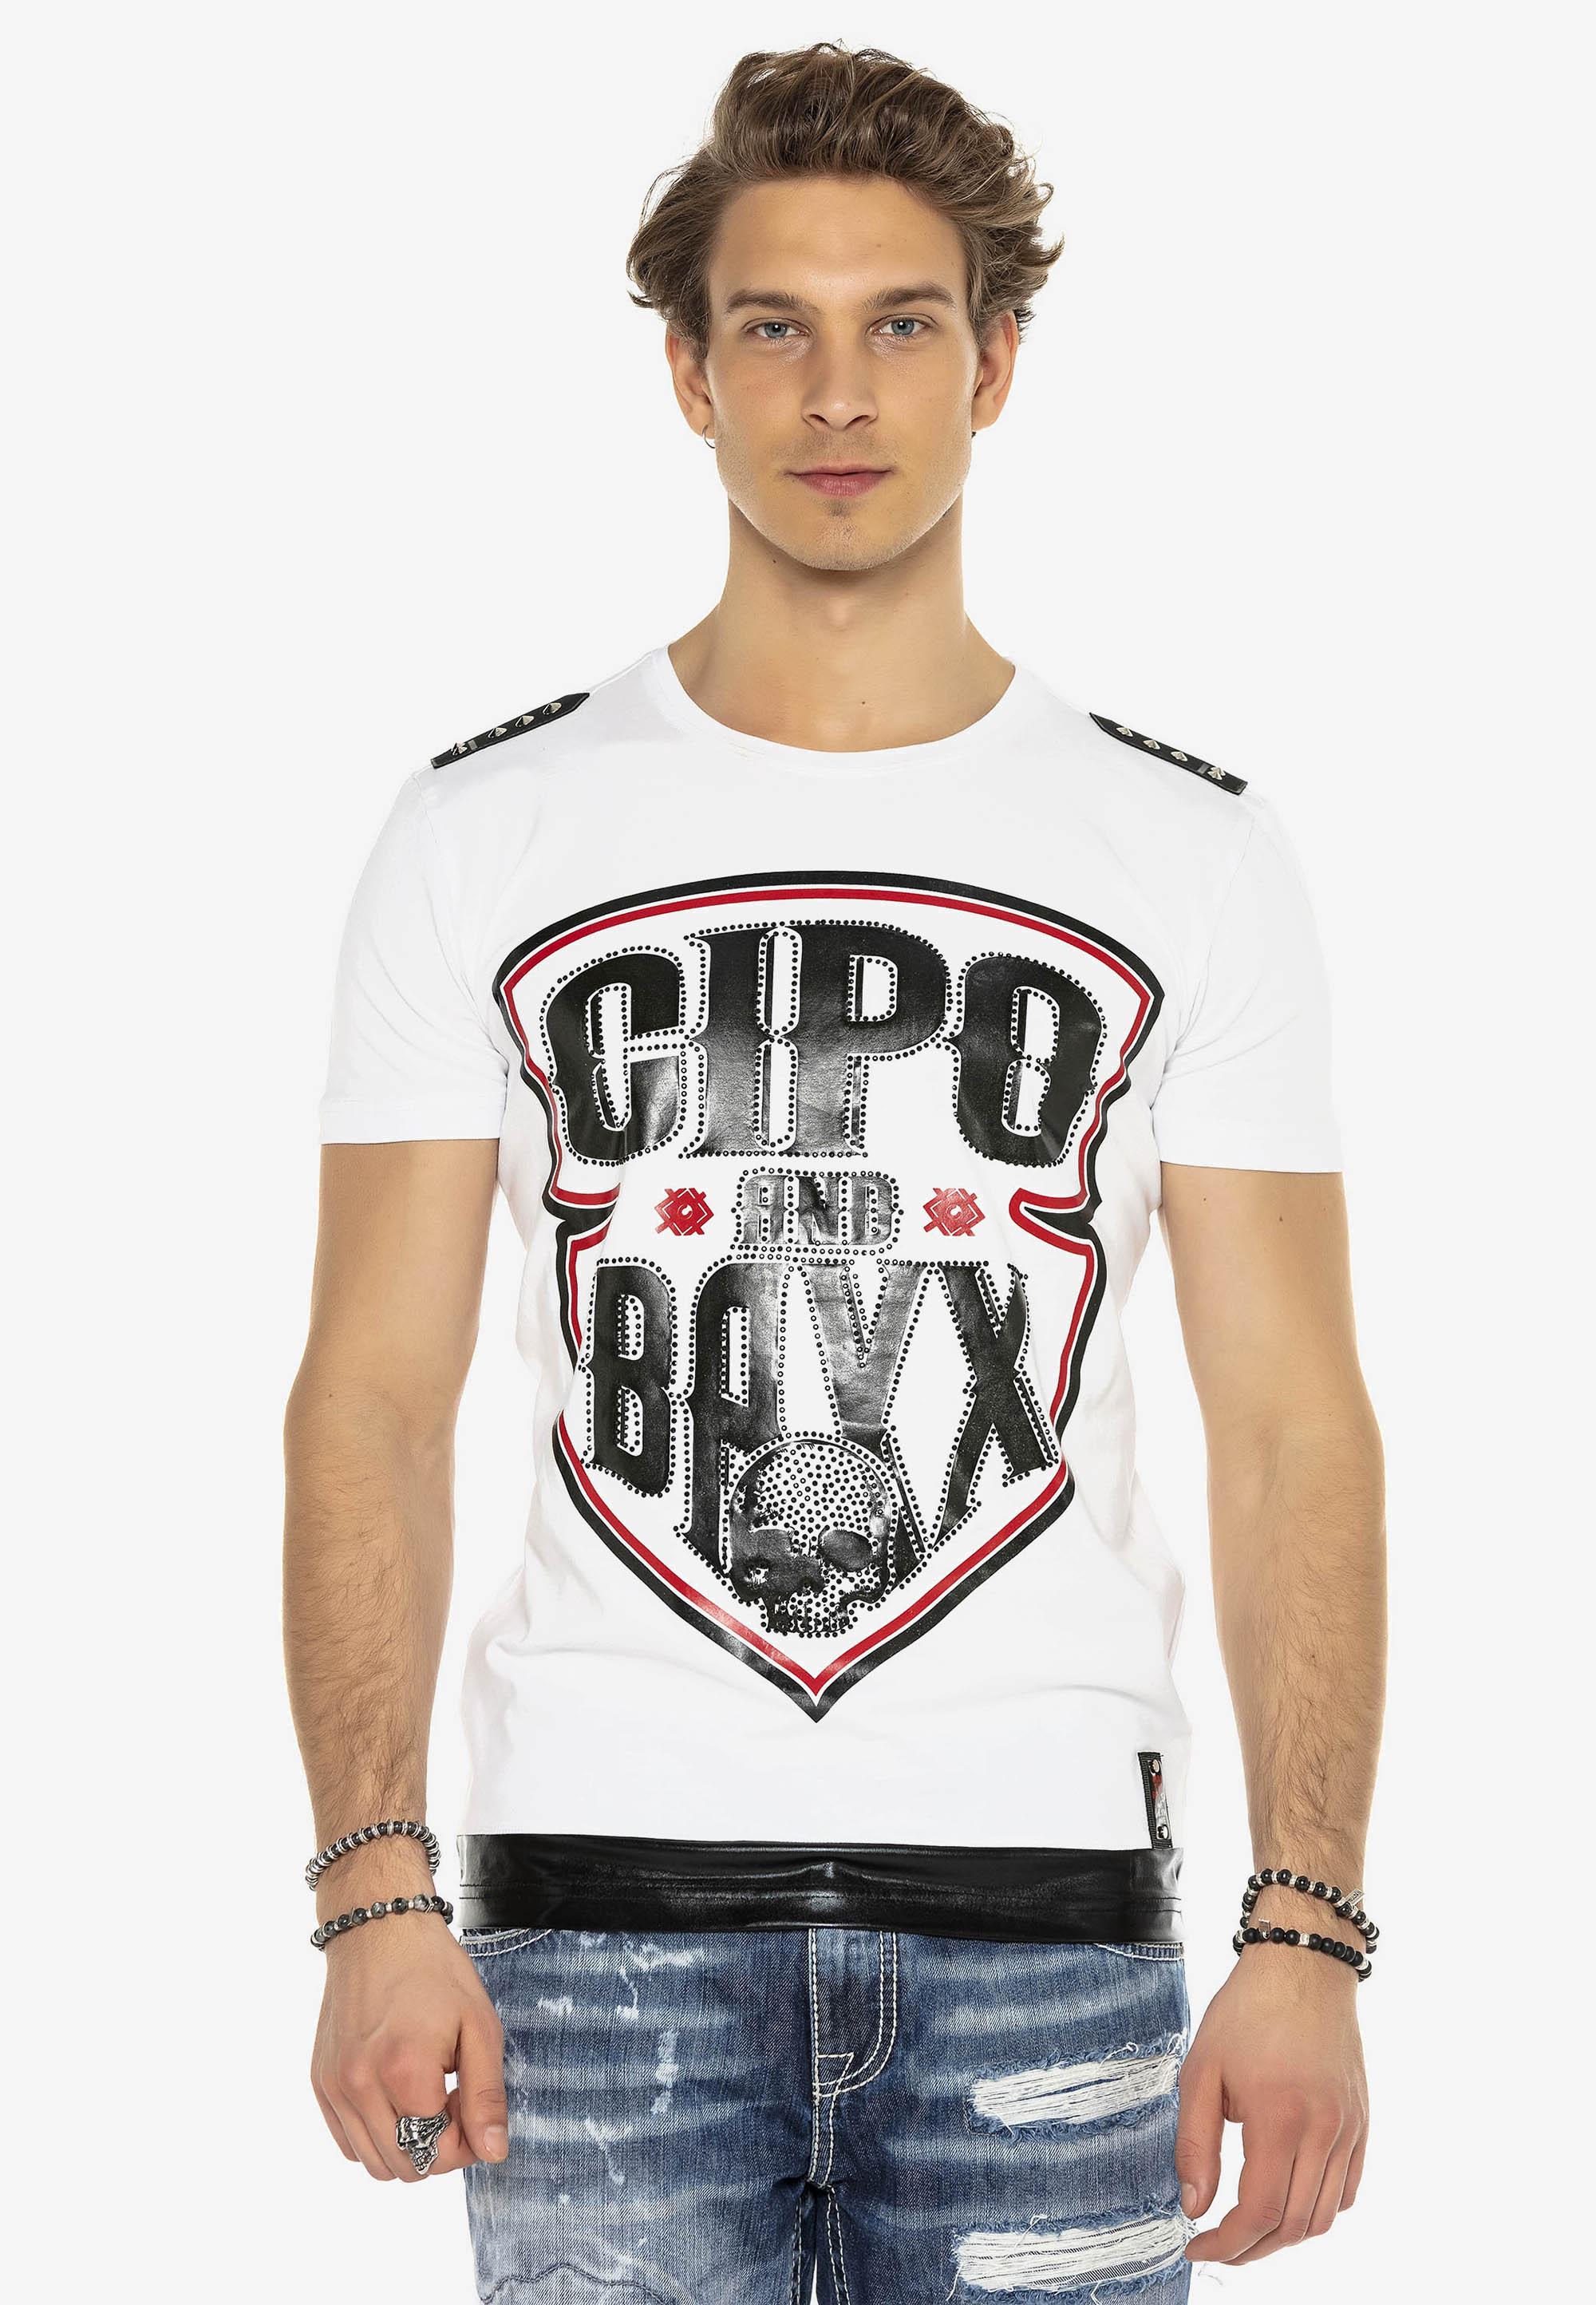 Cipo & Baxx T-Shirt Arrowhead in Weiss günstig kaufen